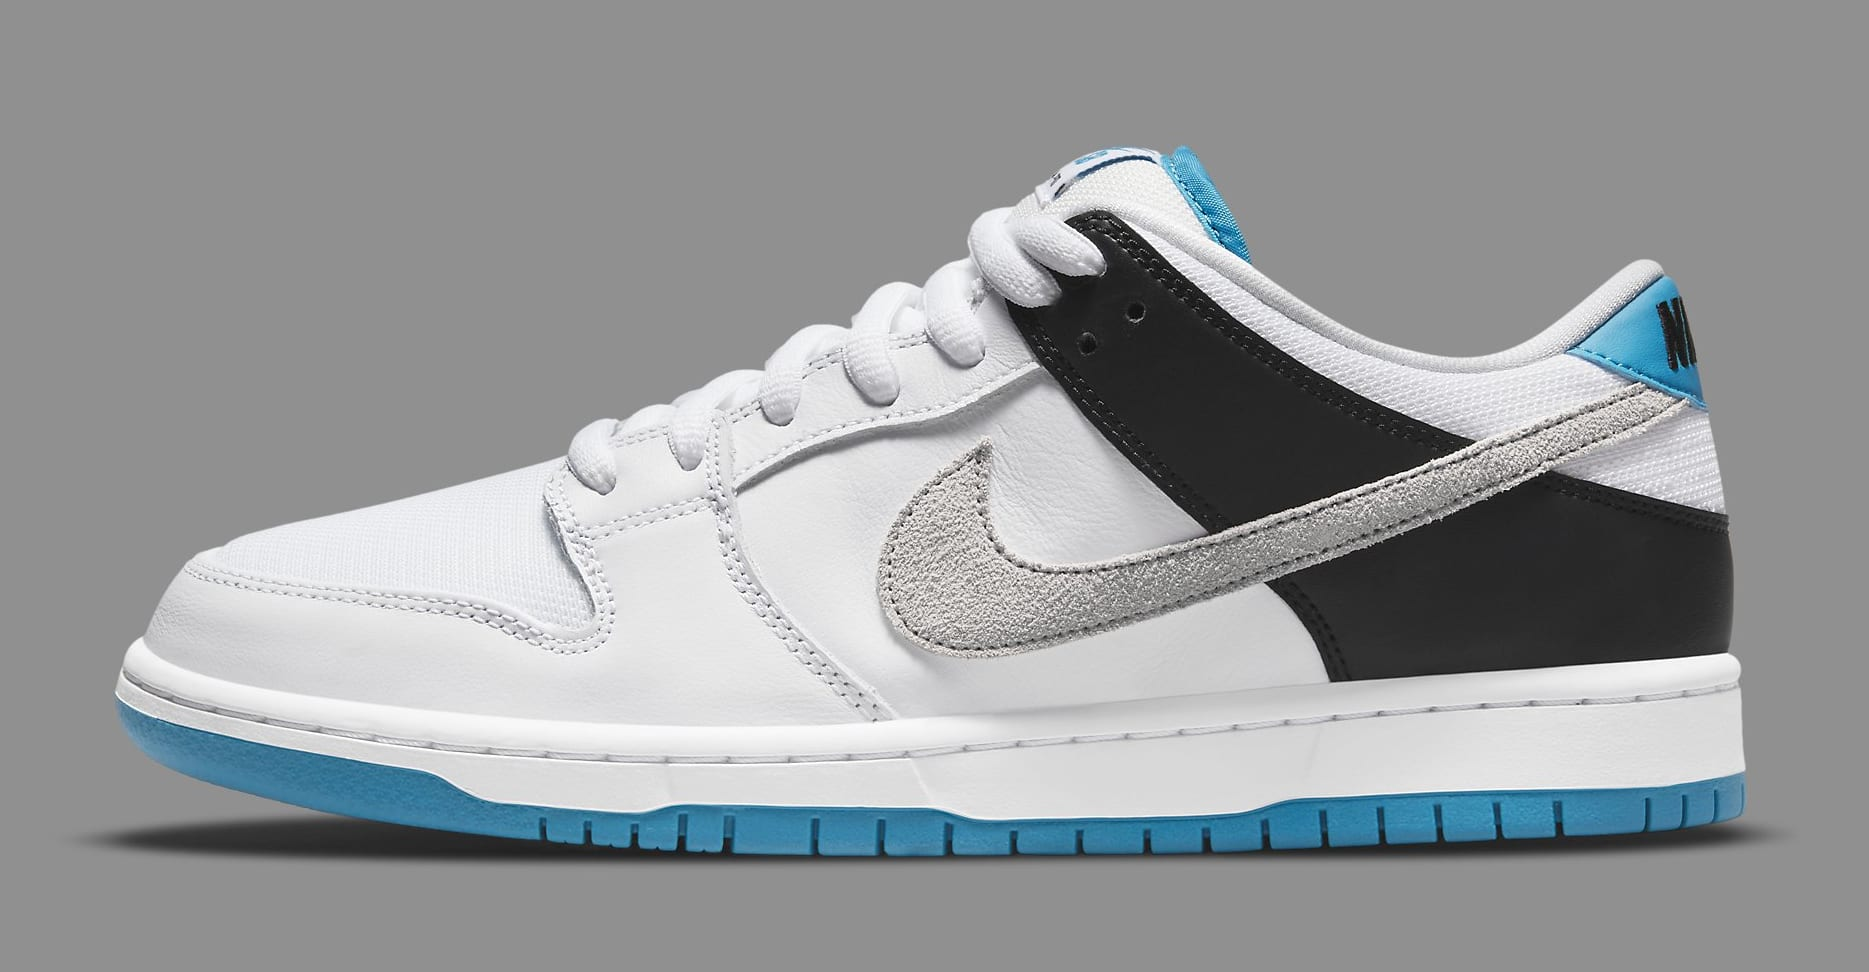 Nike SB Dunk Low 'Laser Blue' BQ6817-101 Lateral